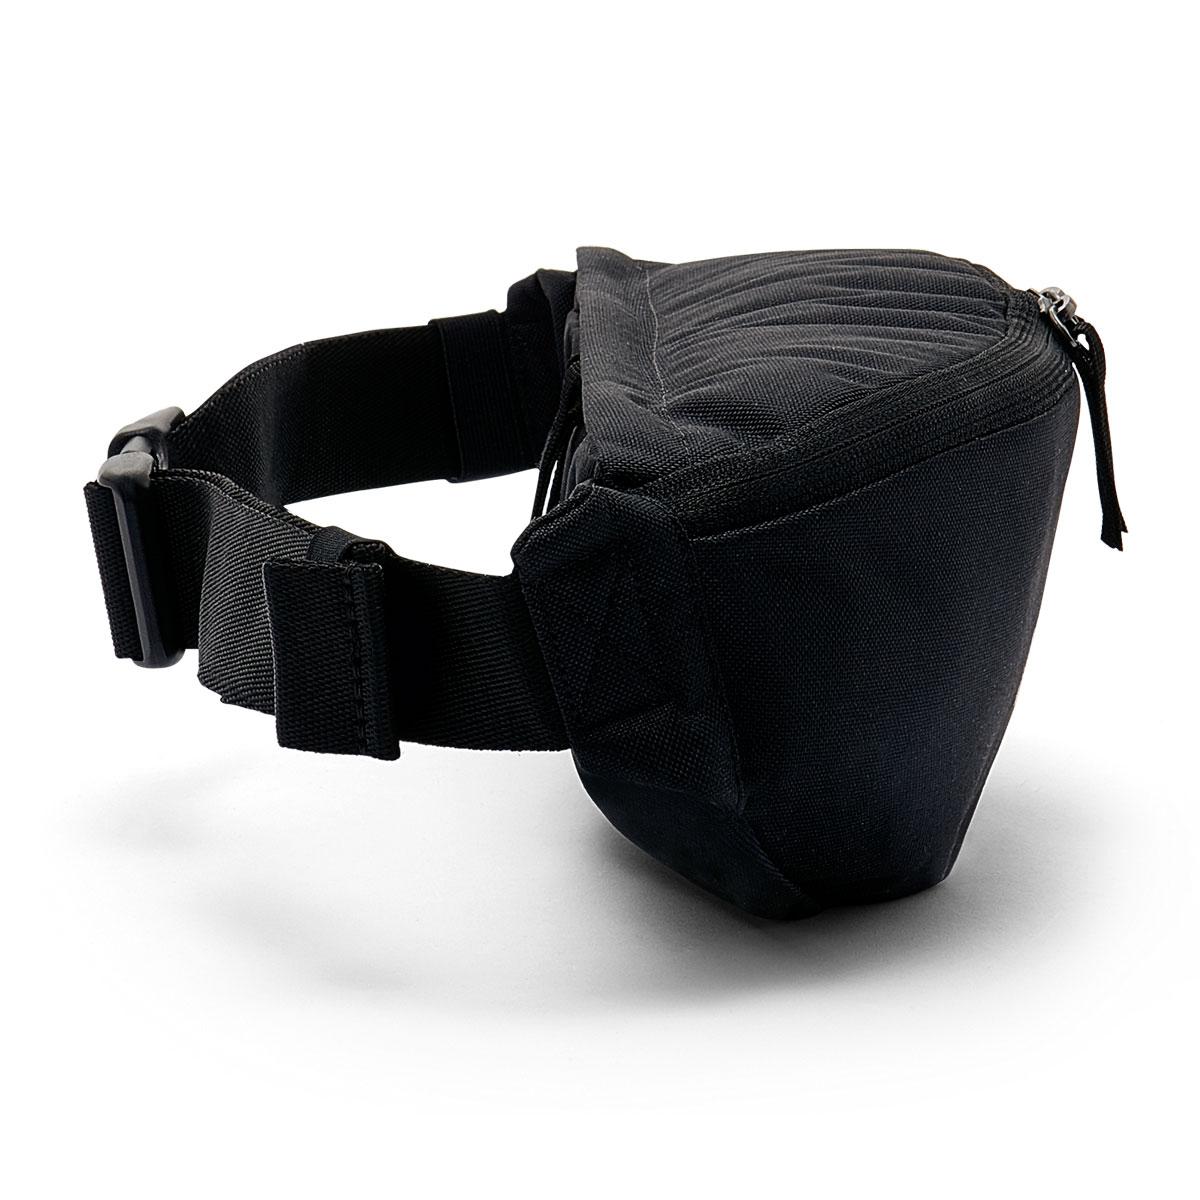 cb1c5c07a8 NIKE NK HERITAGE HIP PACK - EMB (Nike heritage EMB hips pack) BLACK BLACK  WHITE 18FA-I